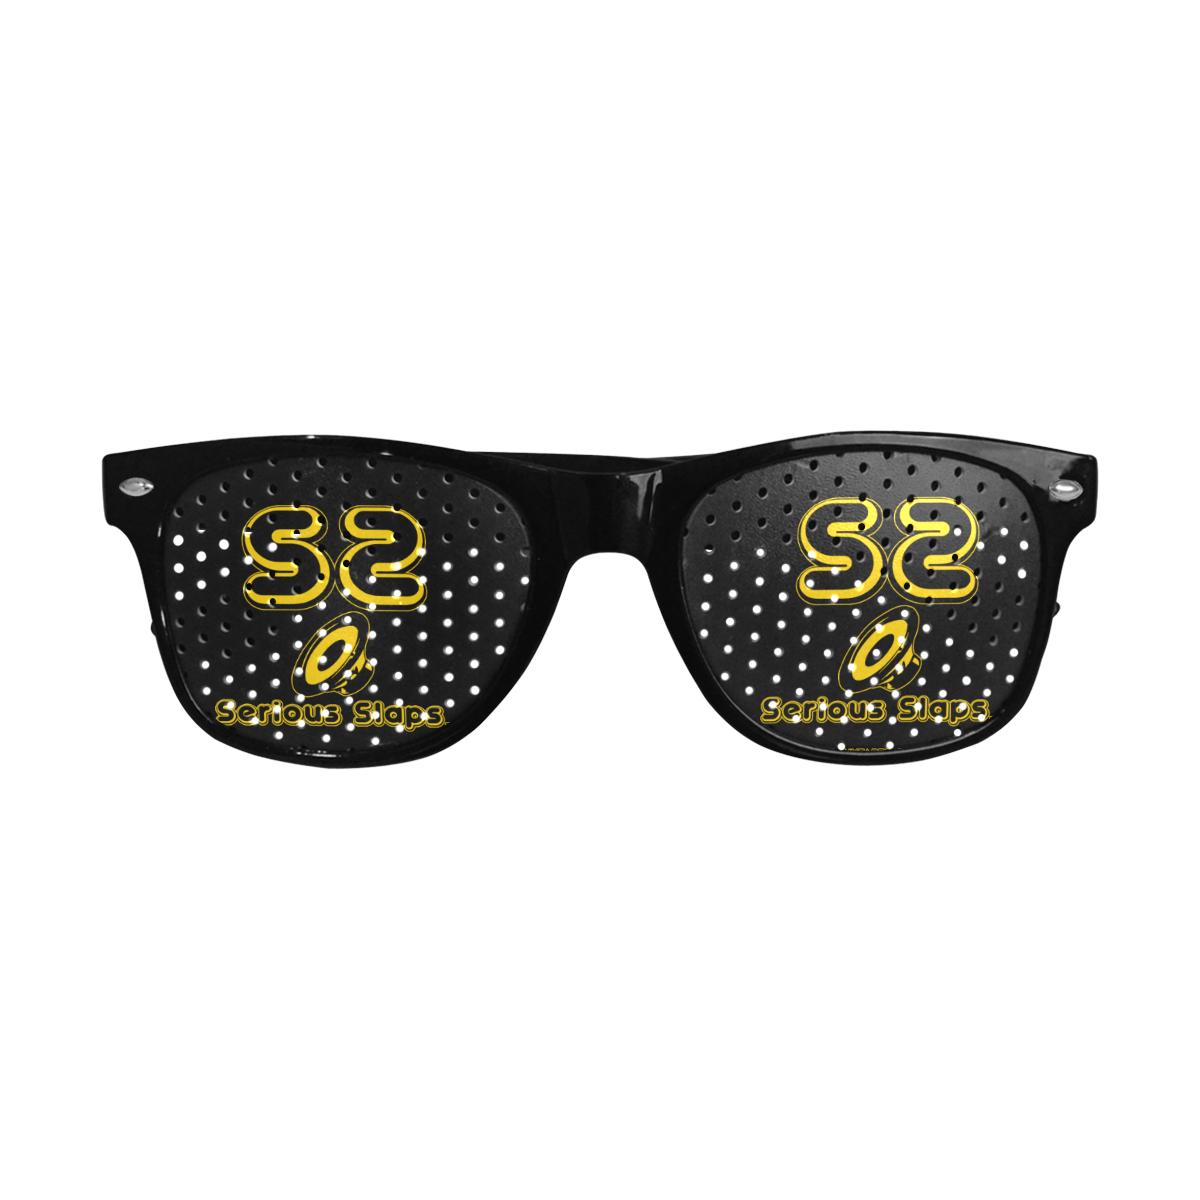 Serious Slaps Sunglasses